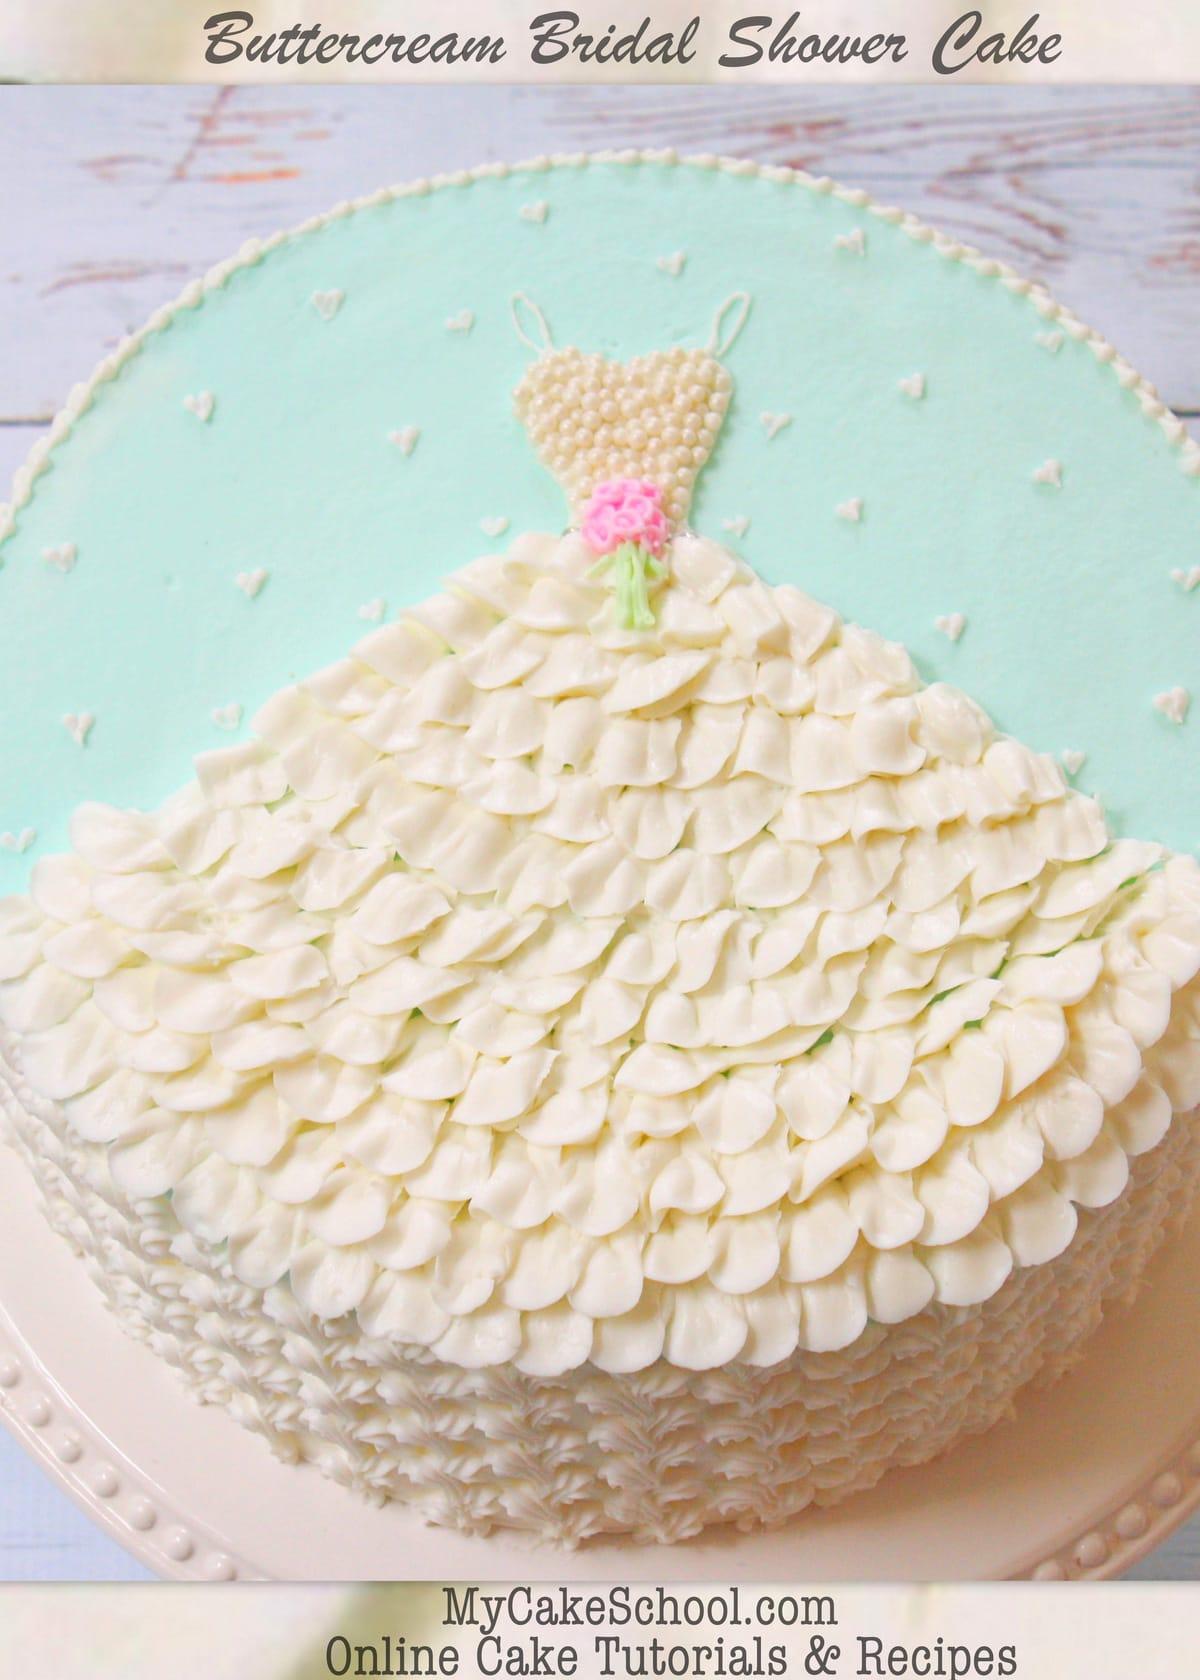 Wedding Cake Decorating Buttercream : Wedding Dress in Buttercream- A Free Cake Decorating ...